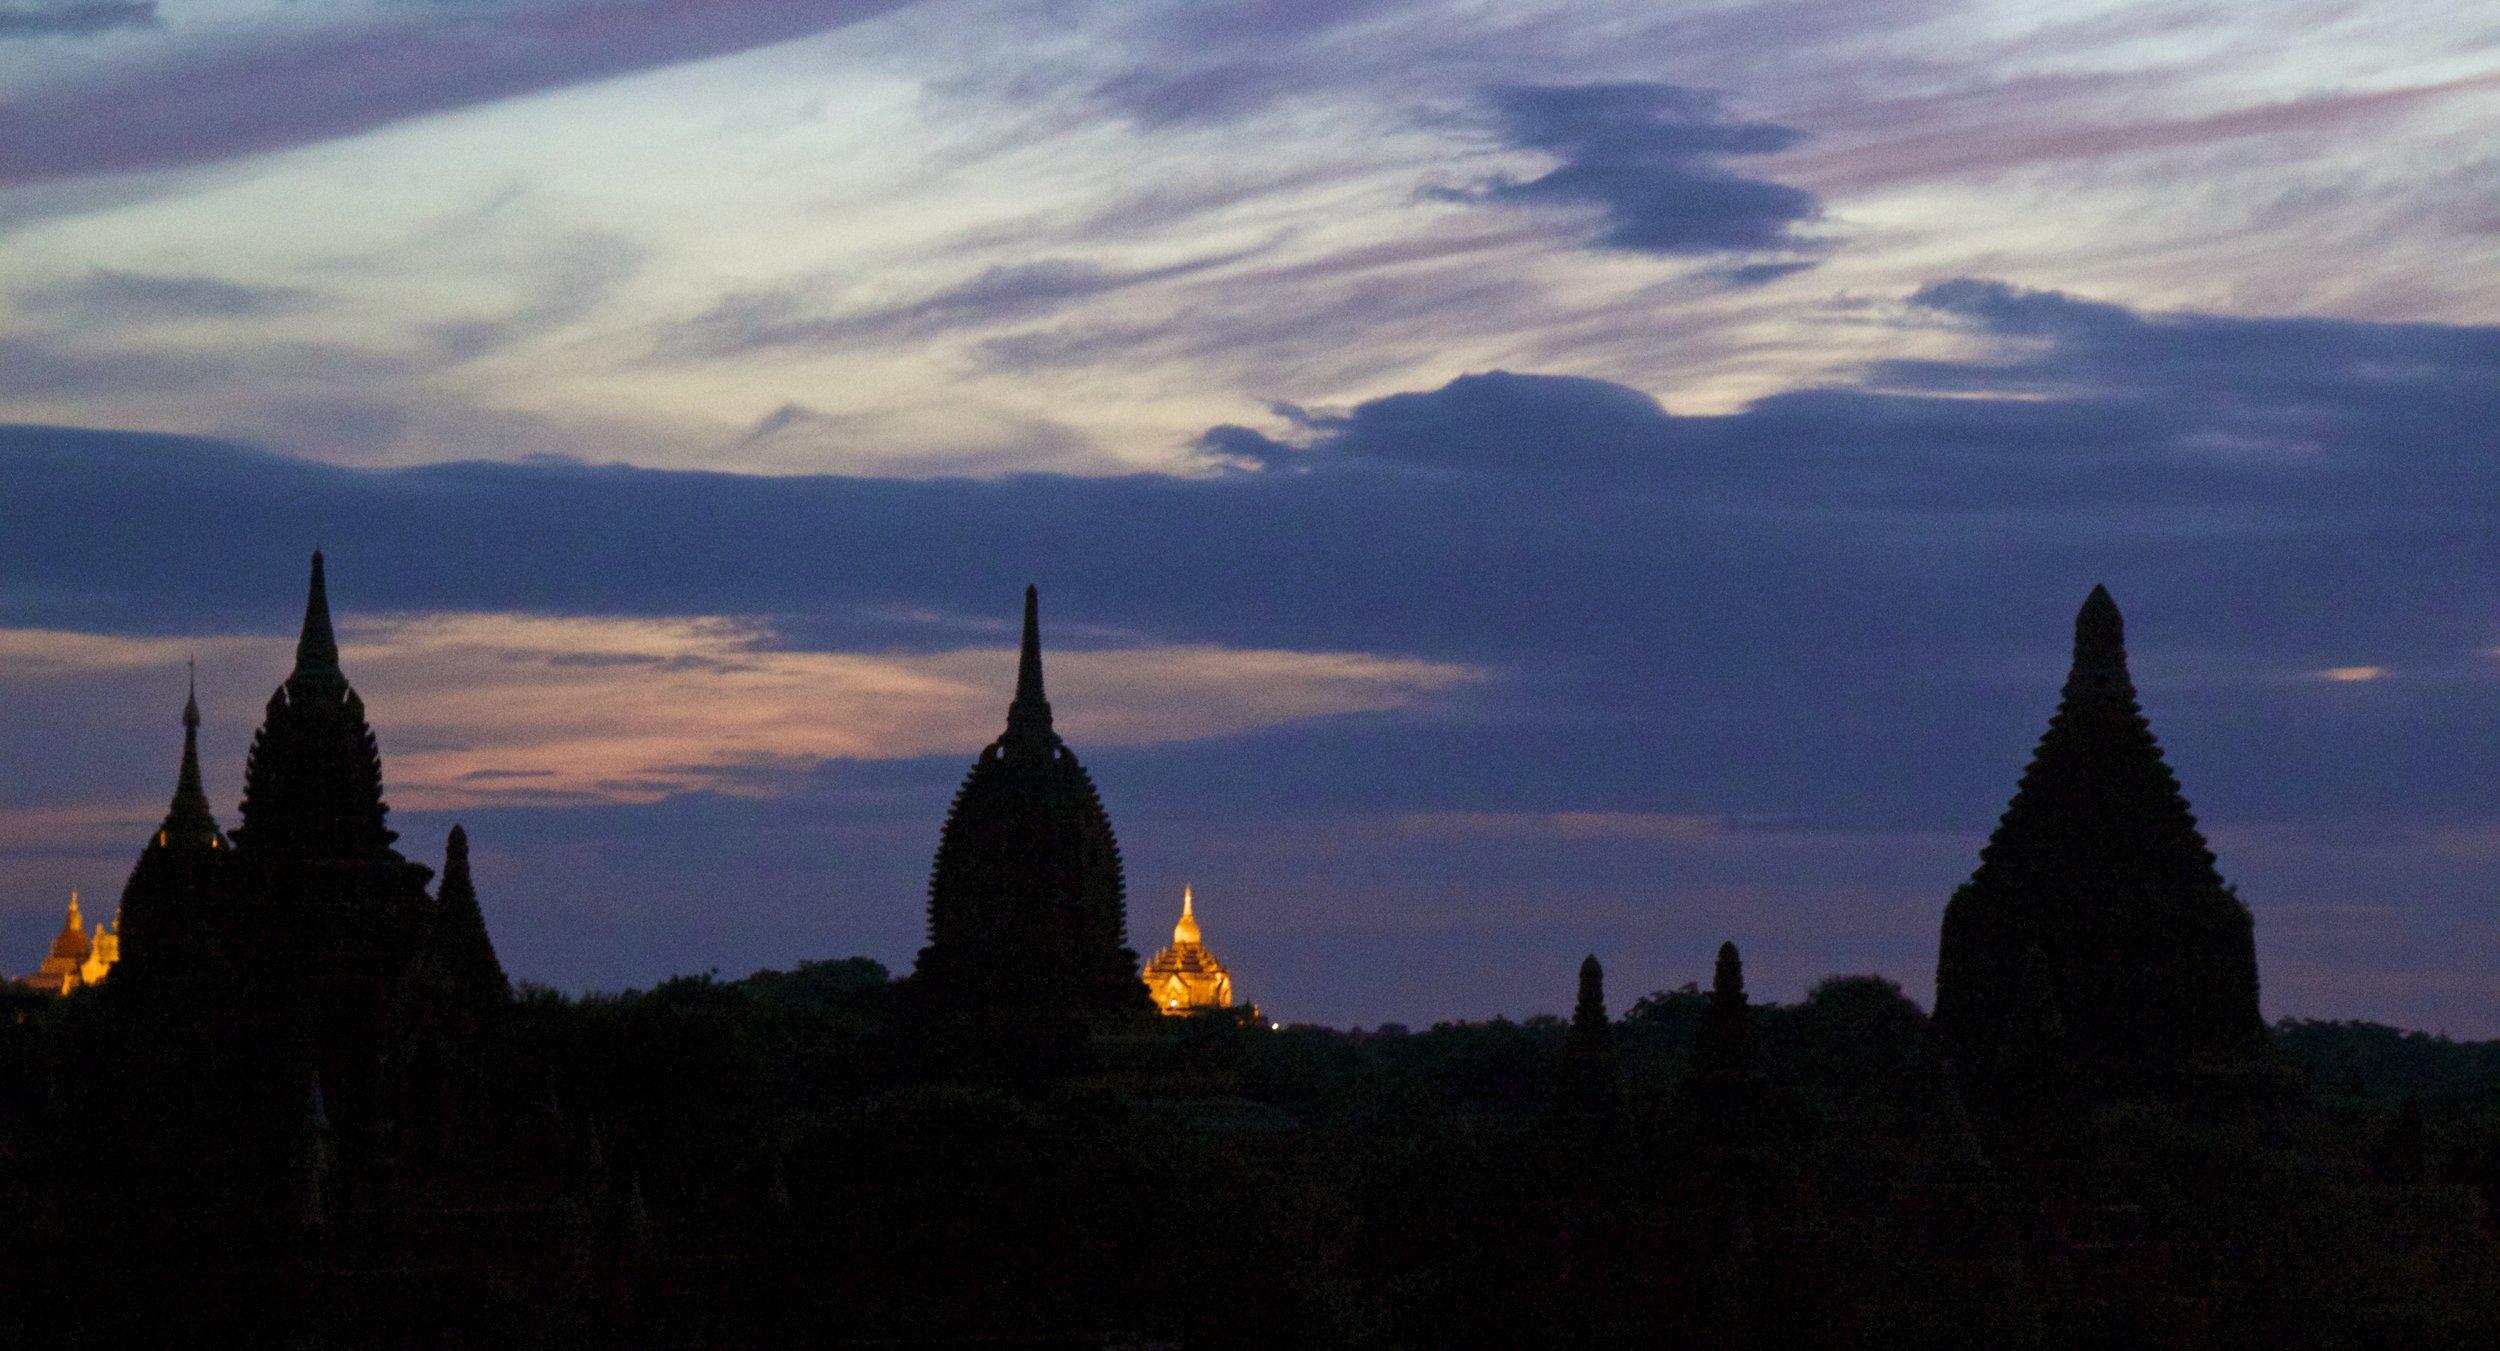 bagan burma myanmar temples sunrise 3.jpg